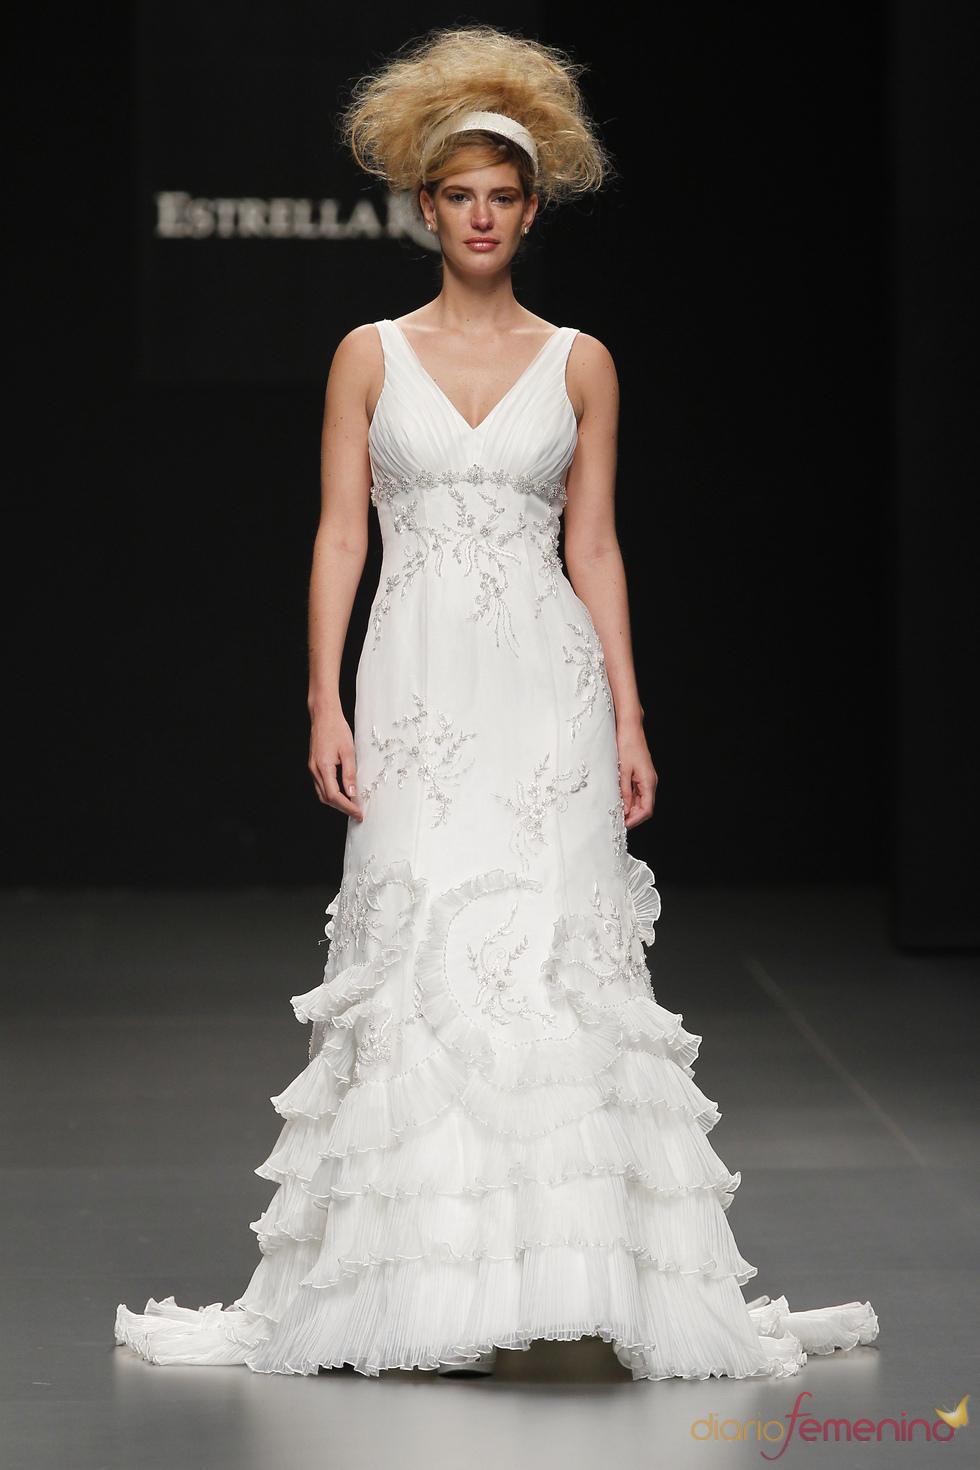 Vestido de novia con escote en pico de Camila Elbaz